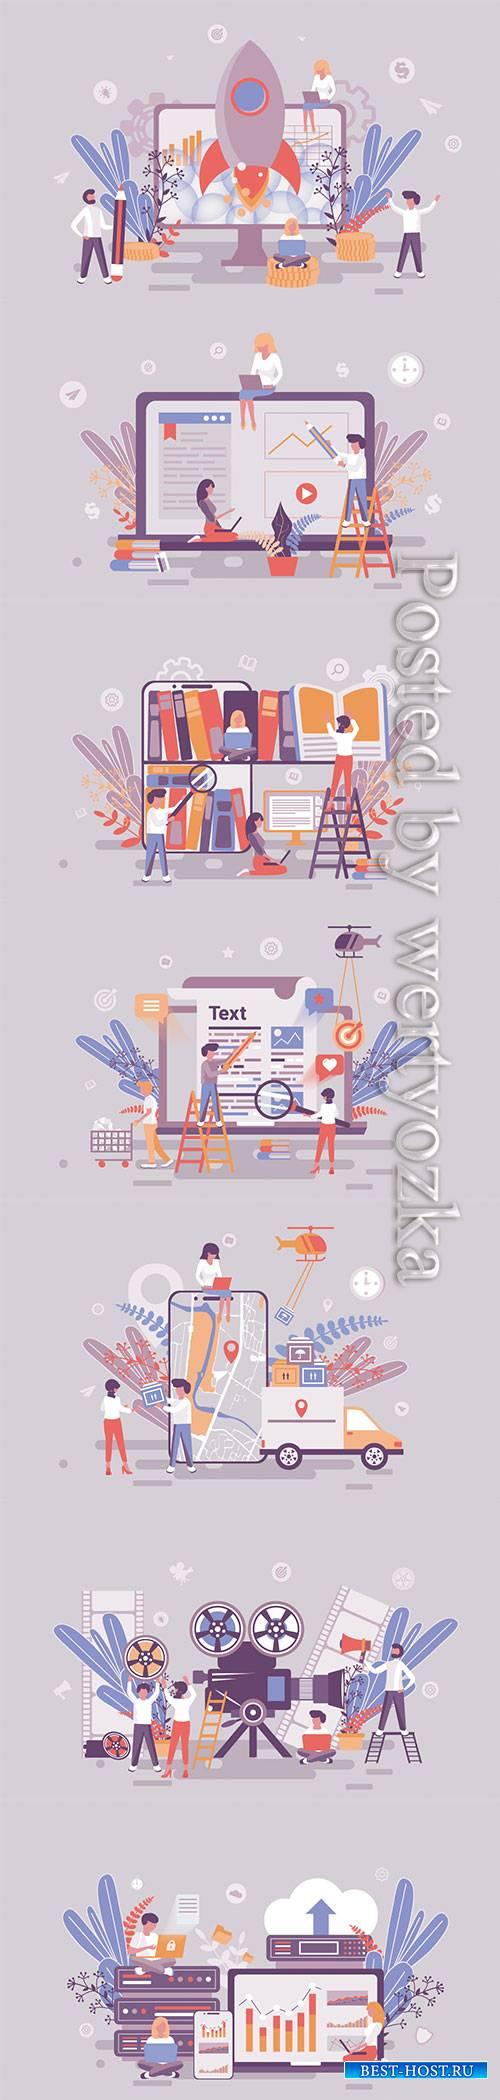 Flat isometric vector 3D concept illustration # 107